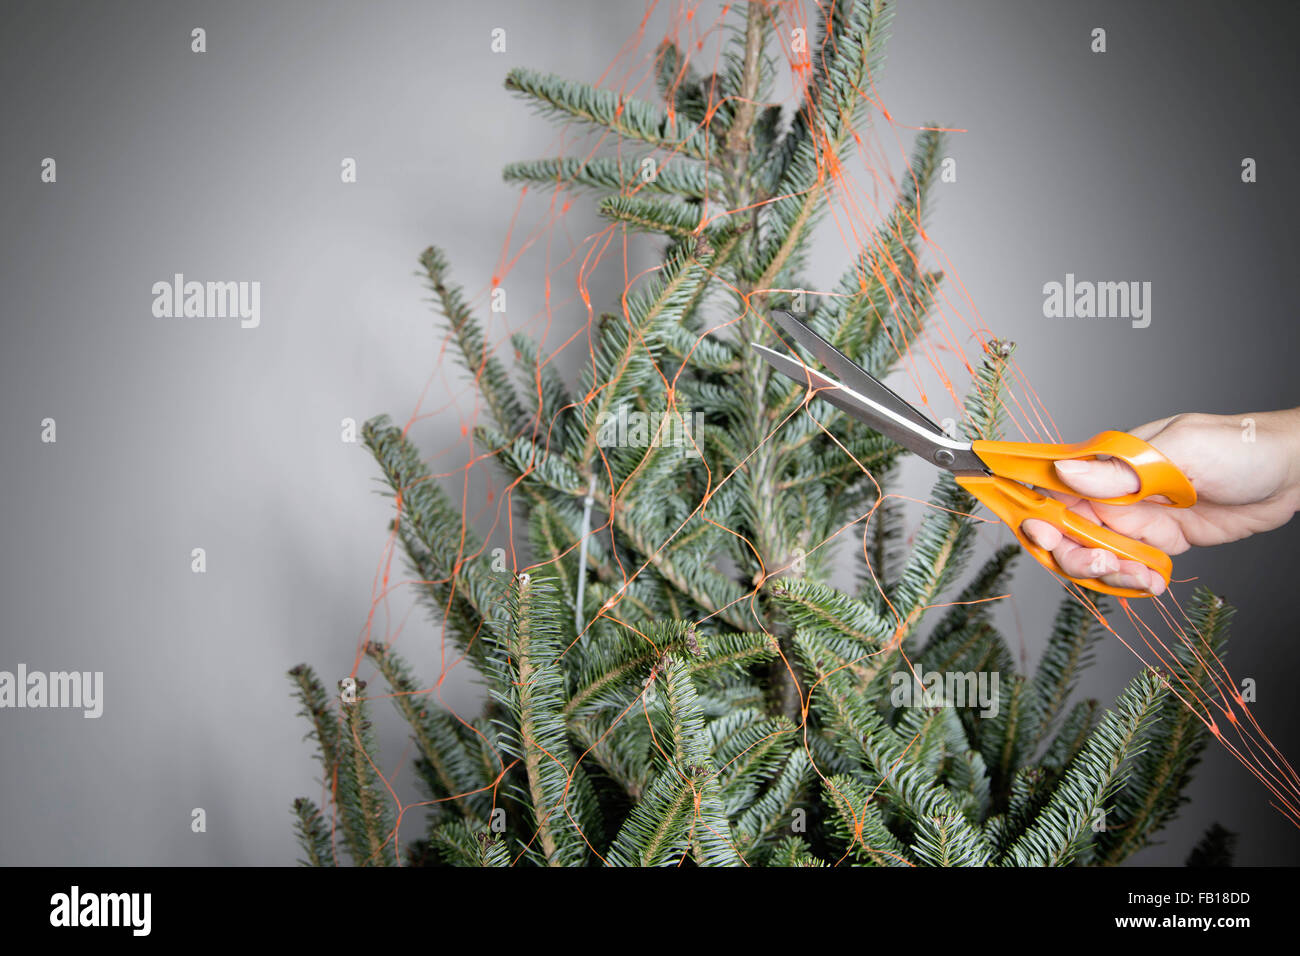 Abeto de Navidad desnudo envuelto en net, interiores Foto de stock